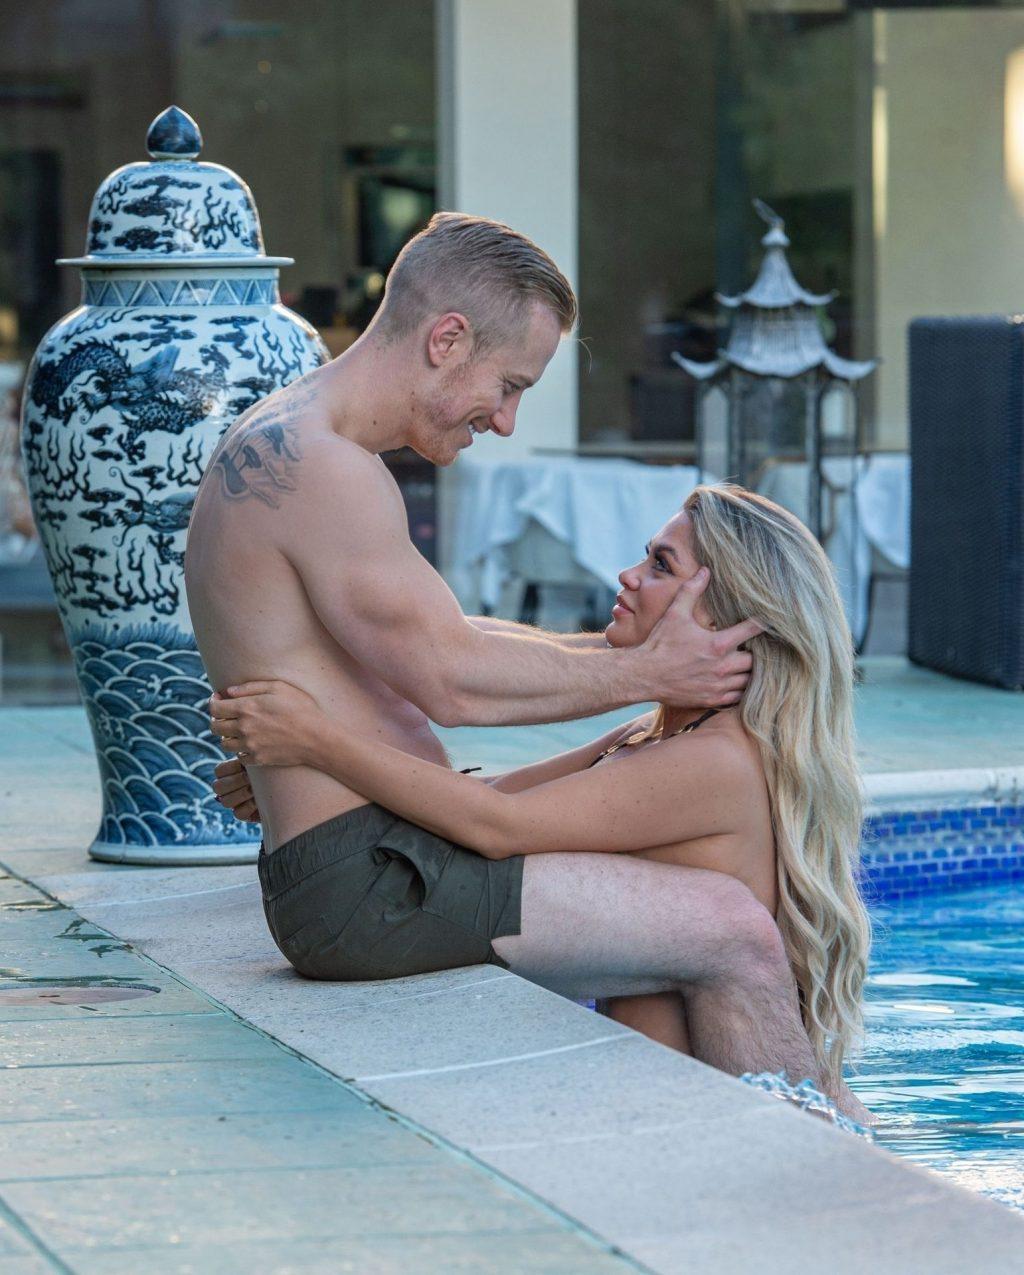 Sexy Bianca Gascoigne & Kris Boyson Are Seen on Their Holiday in Croatia (25 Photos)